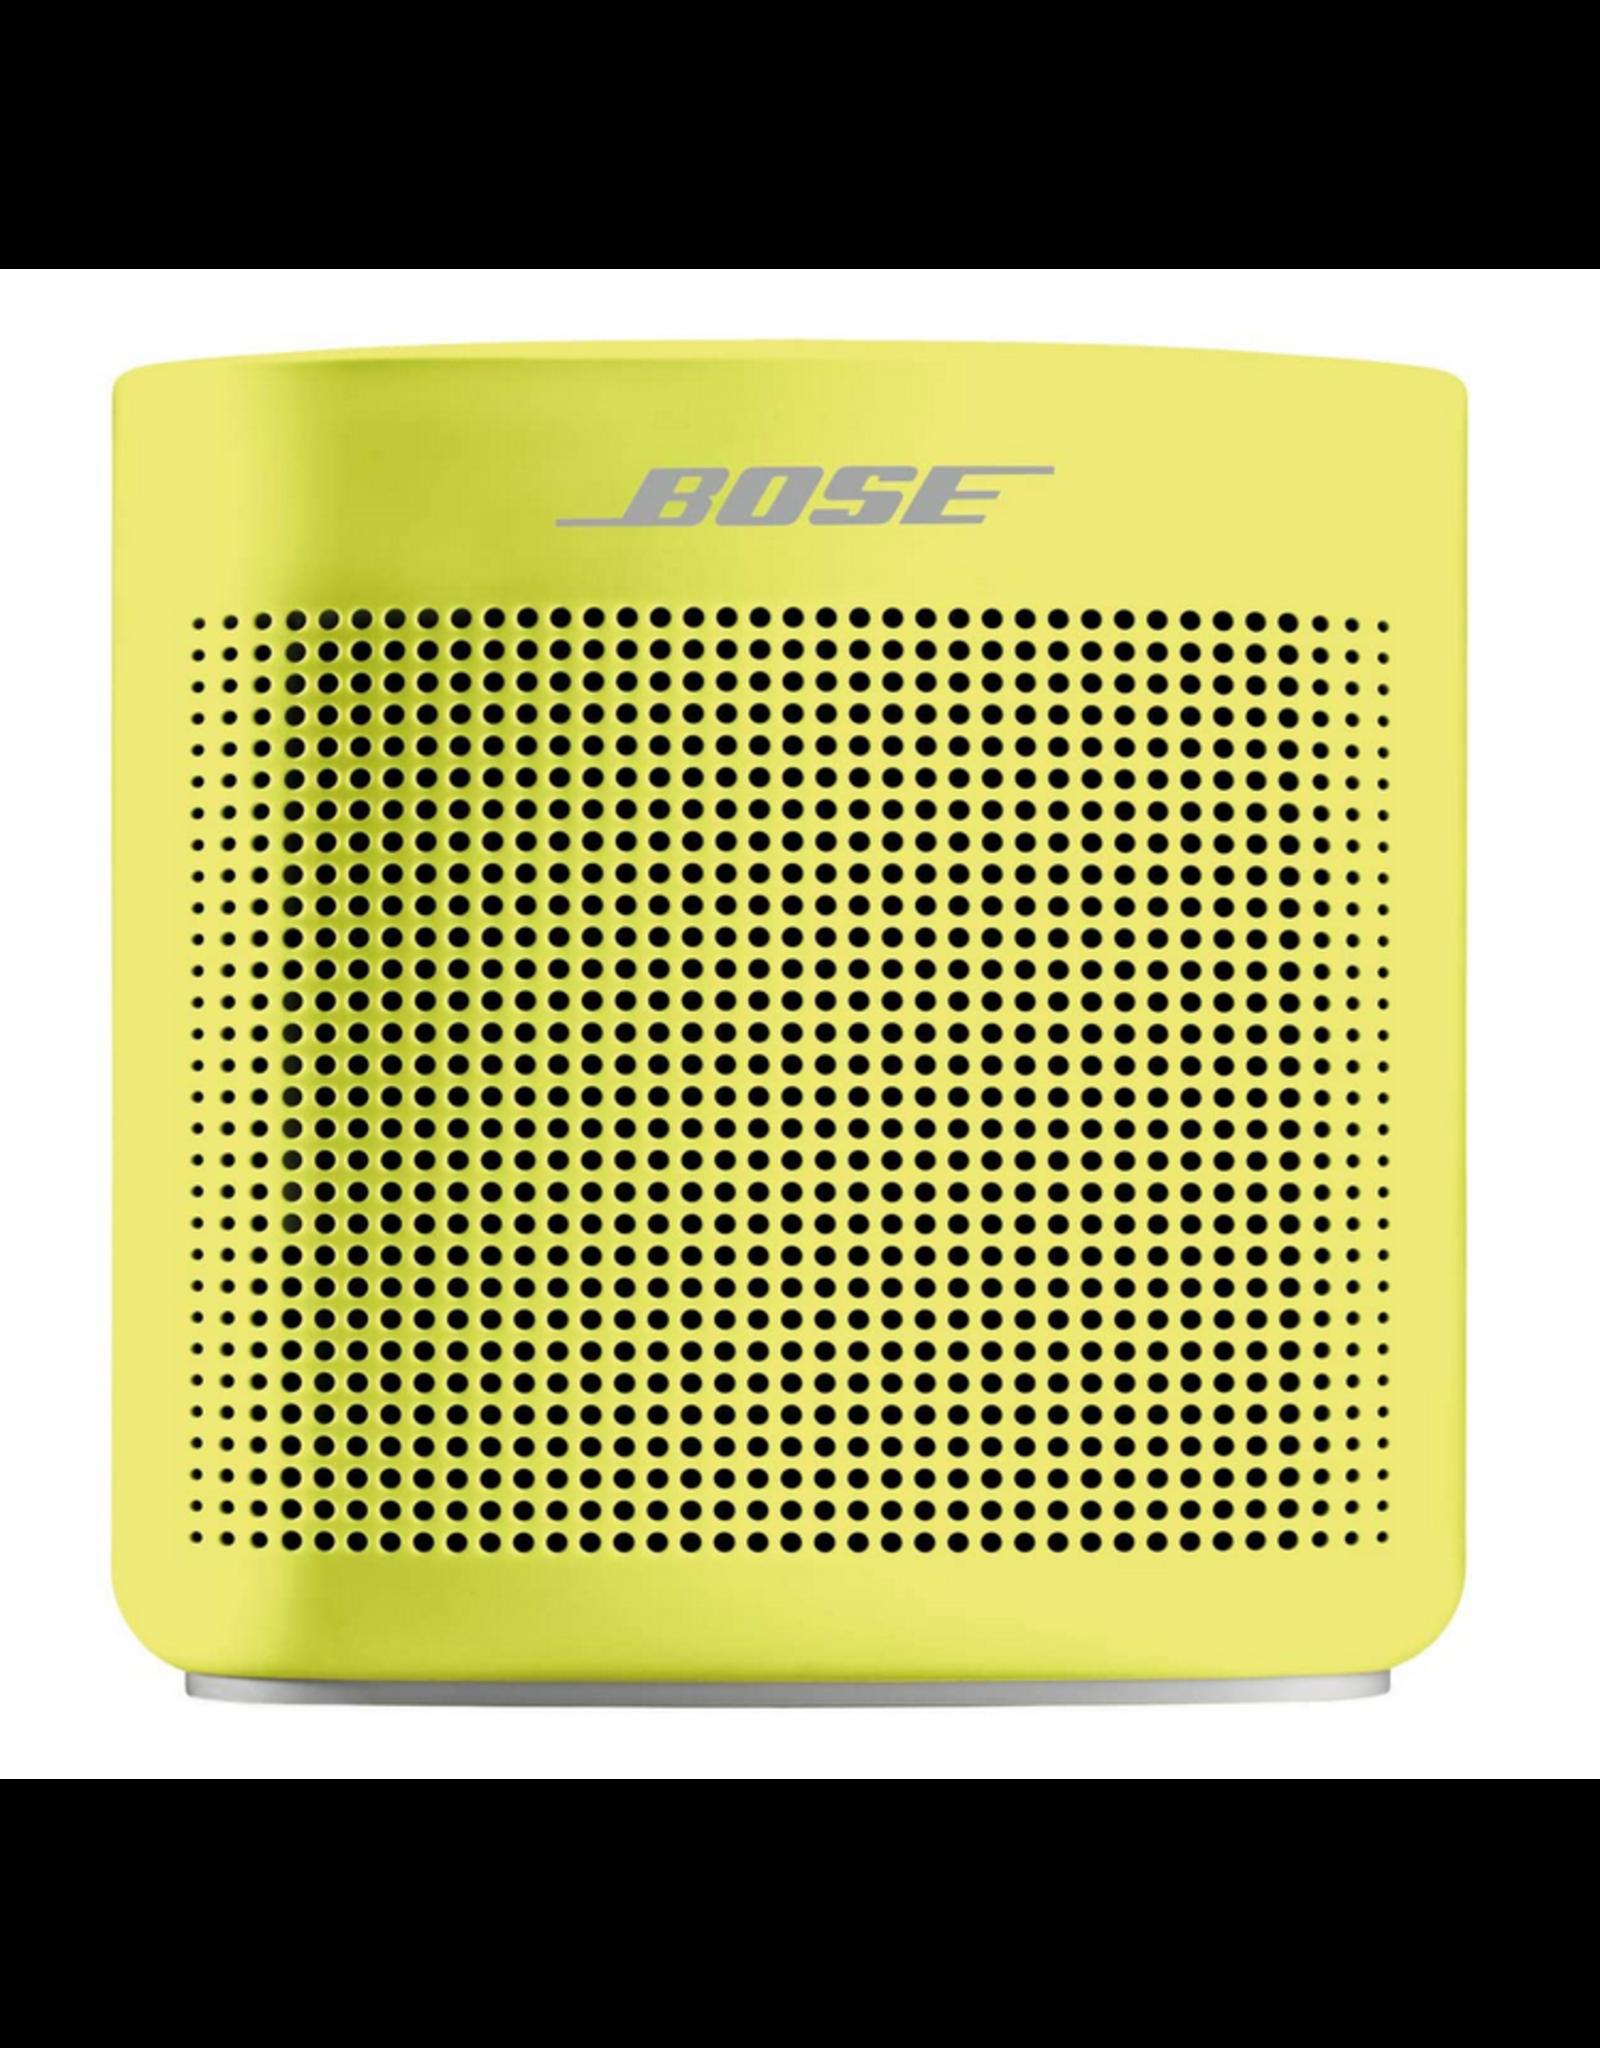 Bose Bose SoundLink Colour Water-Resistant Bluetooth Speaker II, Yellow Citron